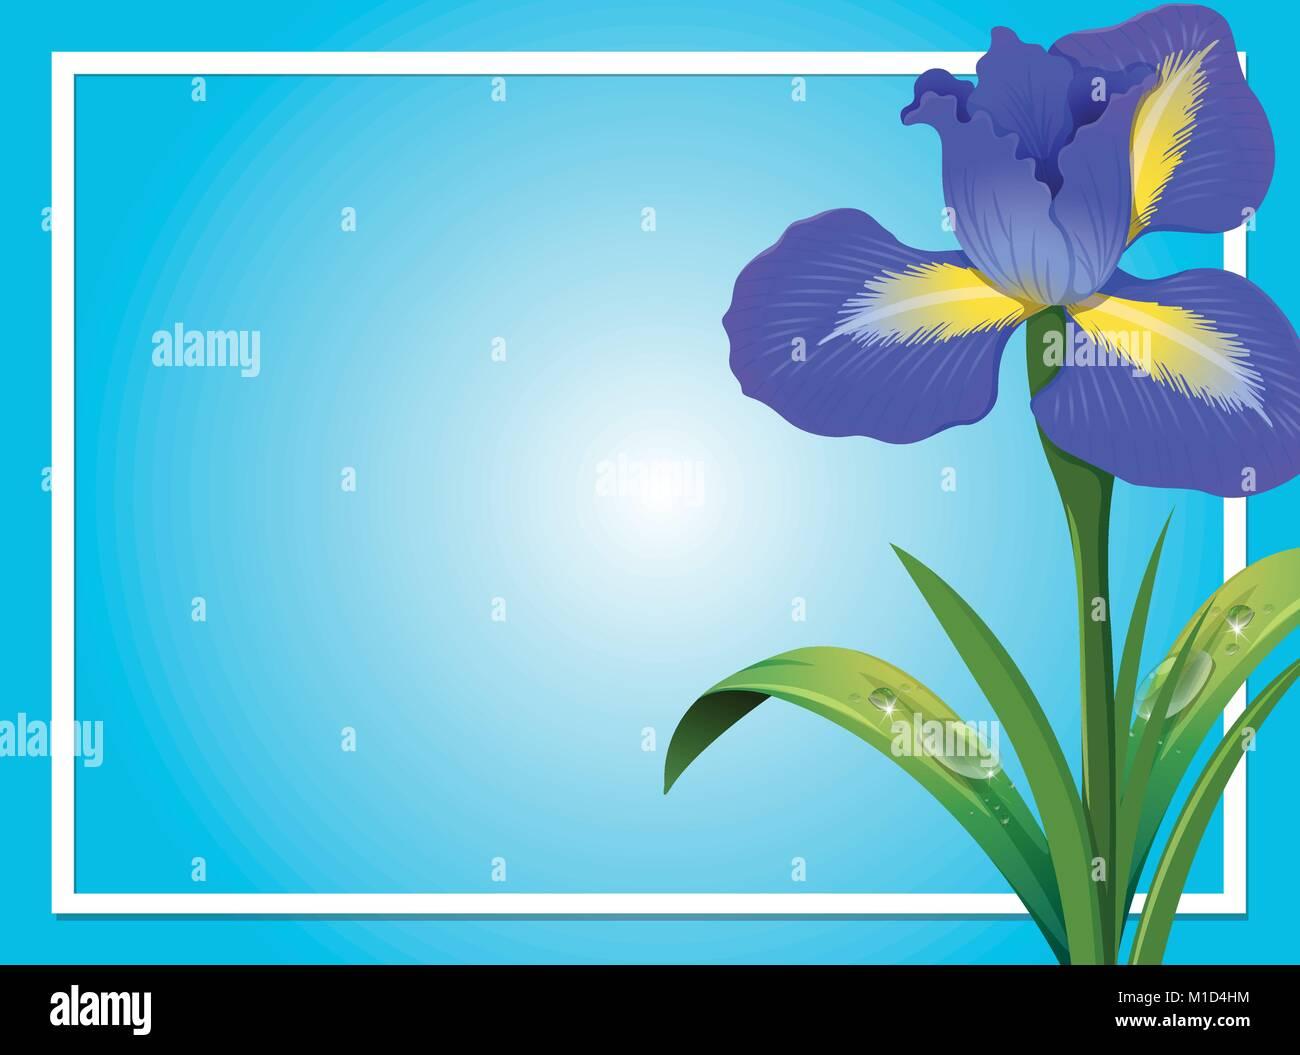 Border Template With Blue Iris Illustration Stock Vector Art